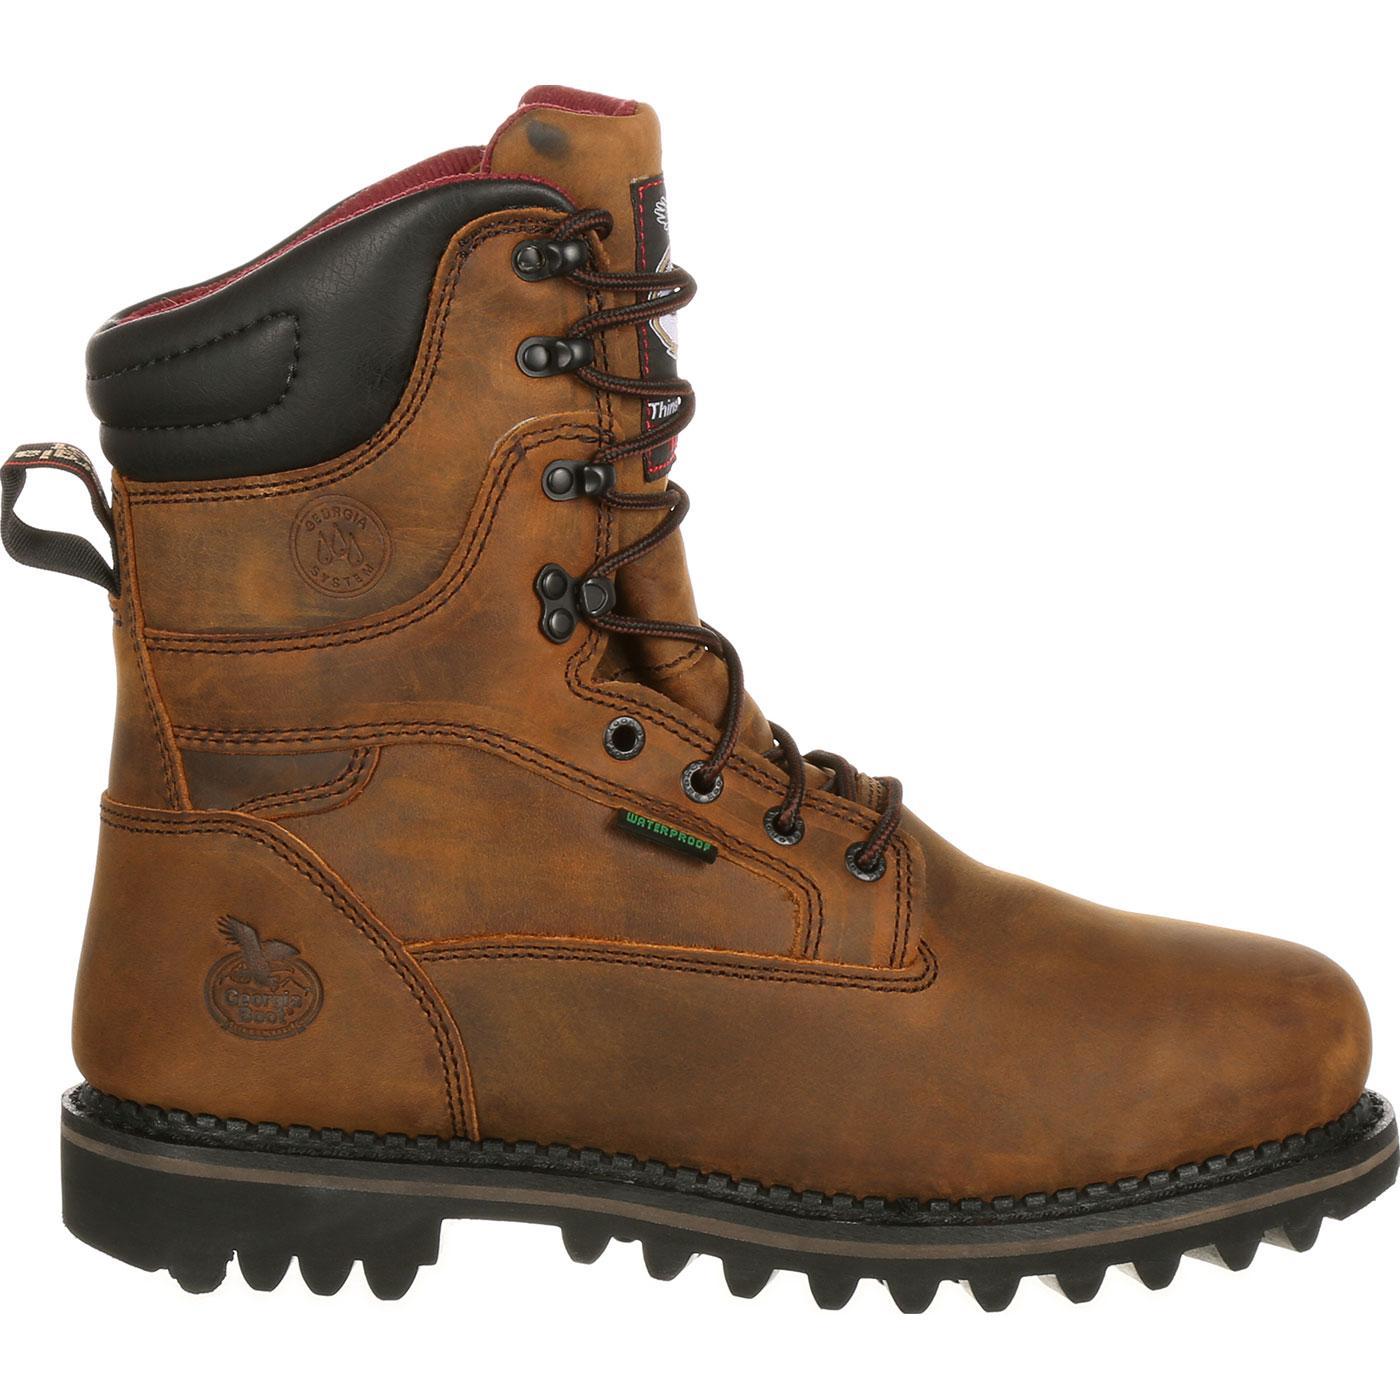 0999ae82817 Georgia Boot Arctic Toe Waterproof Insulated Work Boot